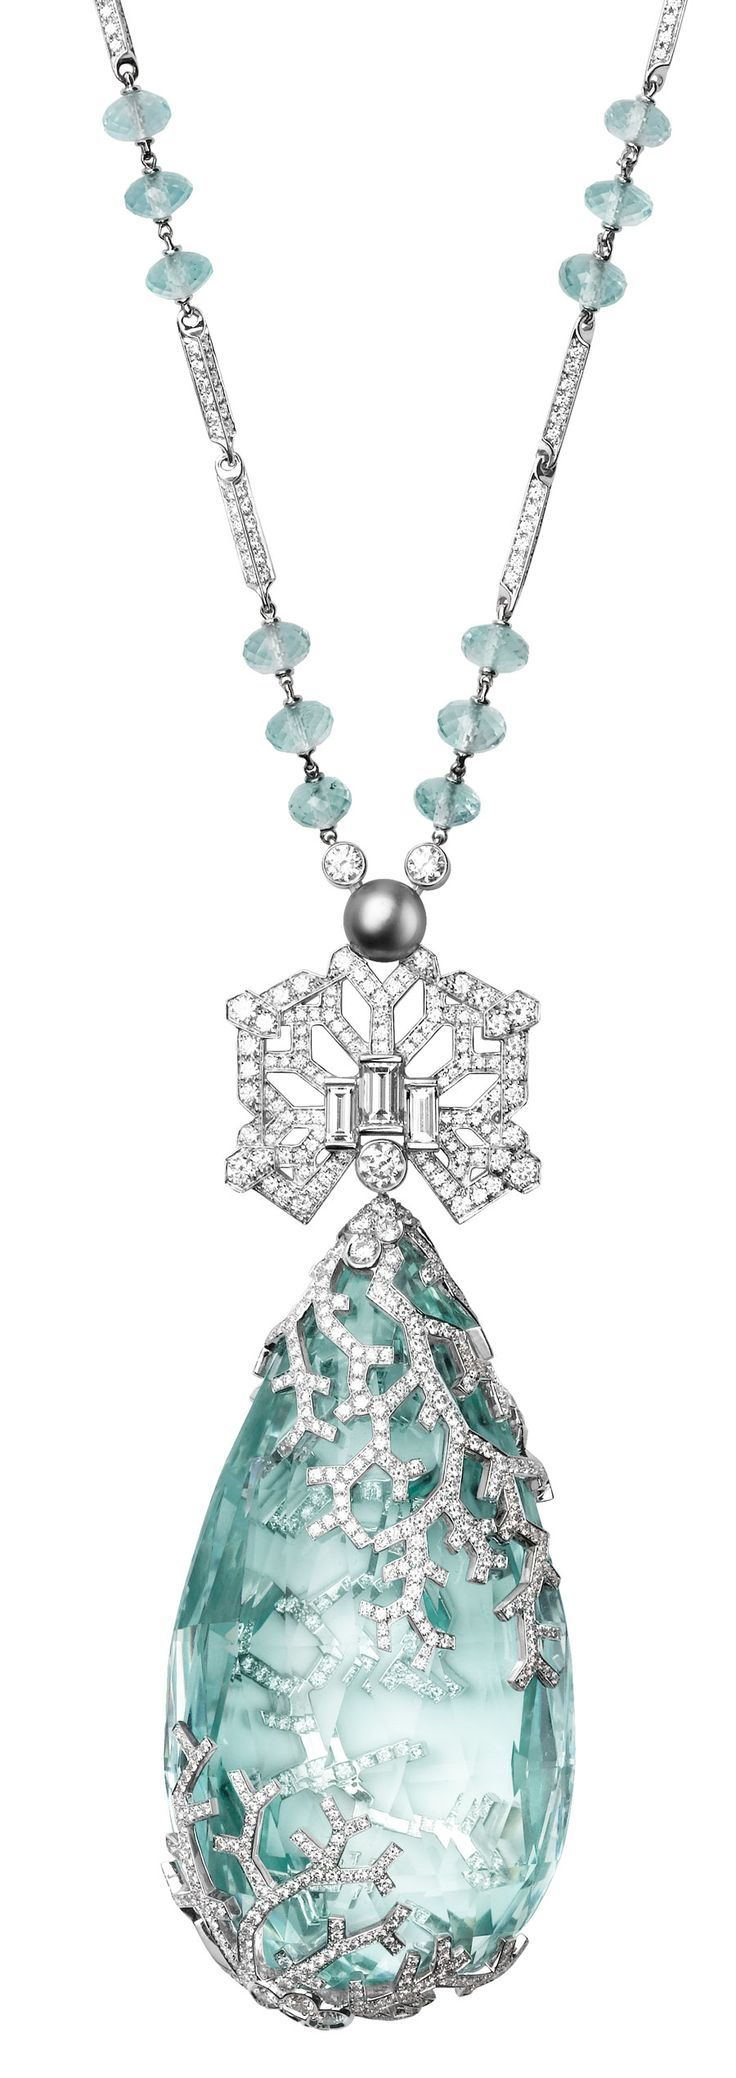 Cartier Biennale Necklace - Platinum, one 236.27-carat aquamarine, one natural pearl, facetted aquamarine beads, baguette-cut diamonds, brilliants. Circa 2012